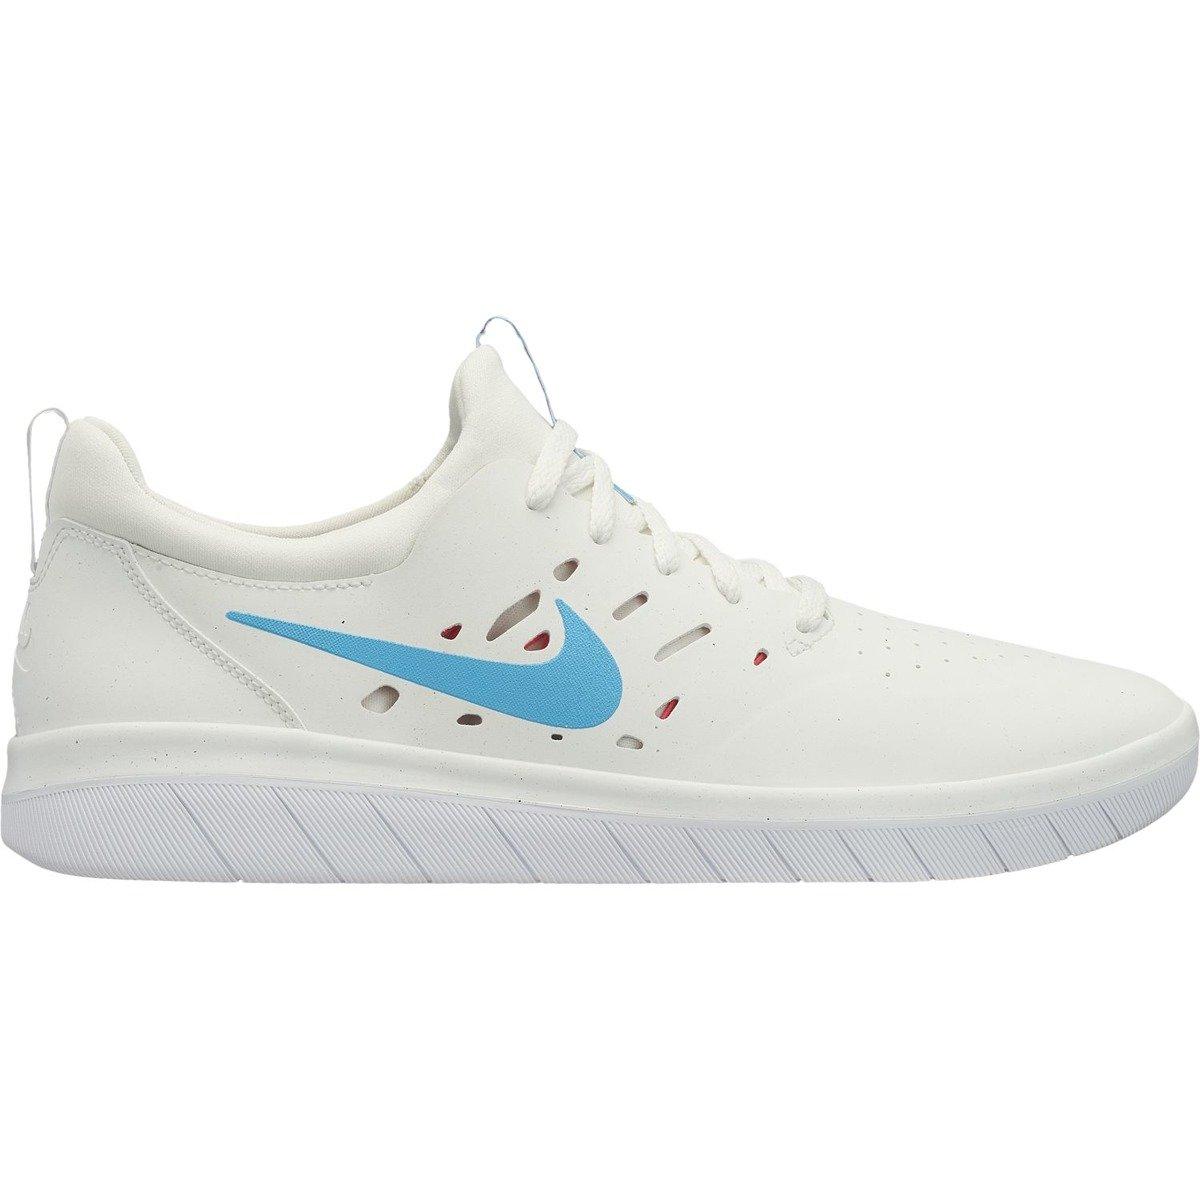 buy online 0a260 9cf5a shoesnike sb nyjah free summit white lt blue fury-solar red white   Shoes   Nike  SB Brands   Nike SB SALE   Sale - 40%   Shoes Buty   Nike SB   Nike SB Fall  ...